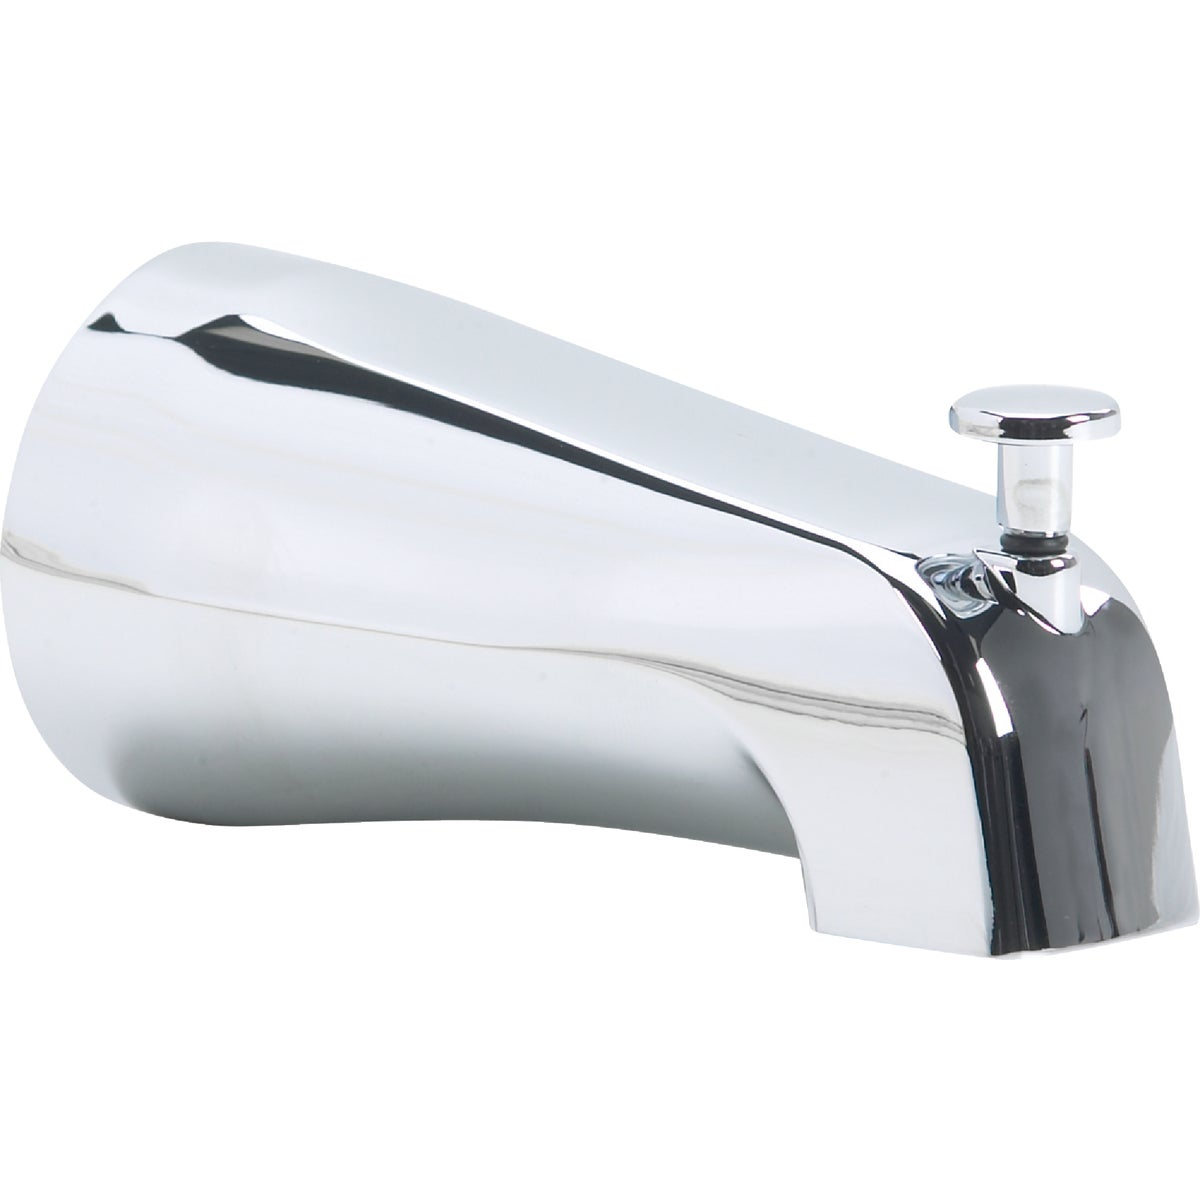 Kohler SLIP DIVERTER BATH SPOUT GP85556-CP